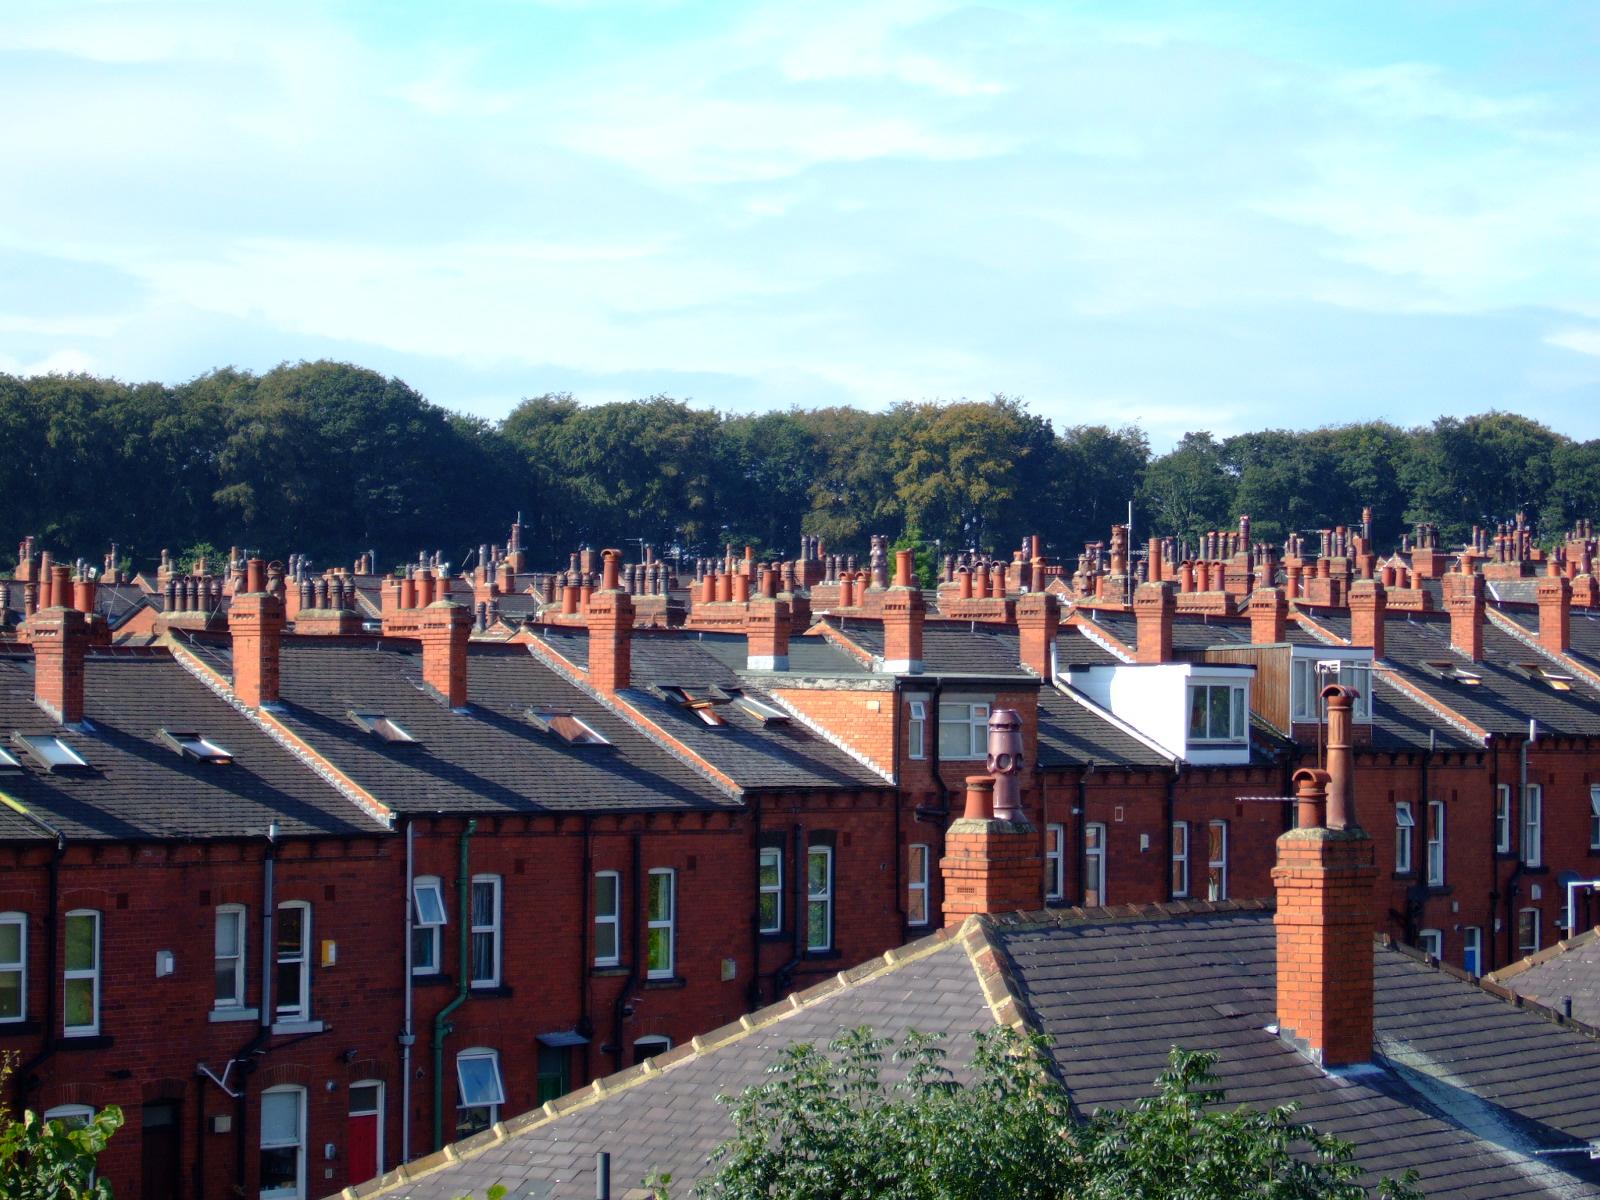 Roof-tops_in_Headingley